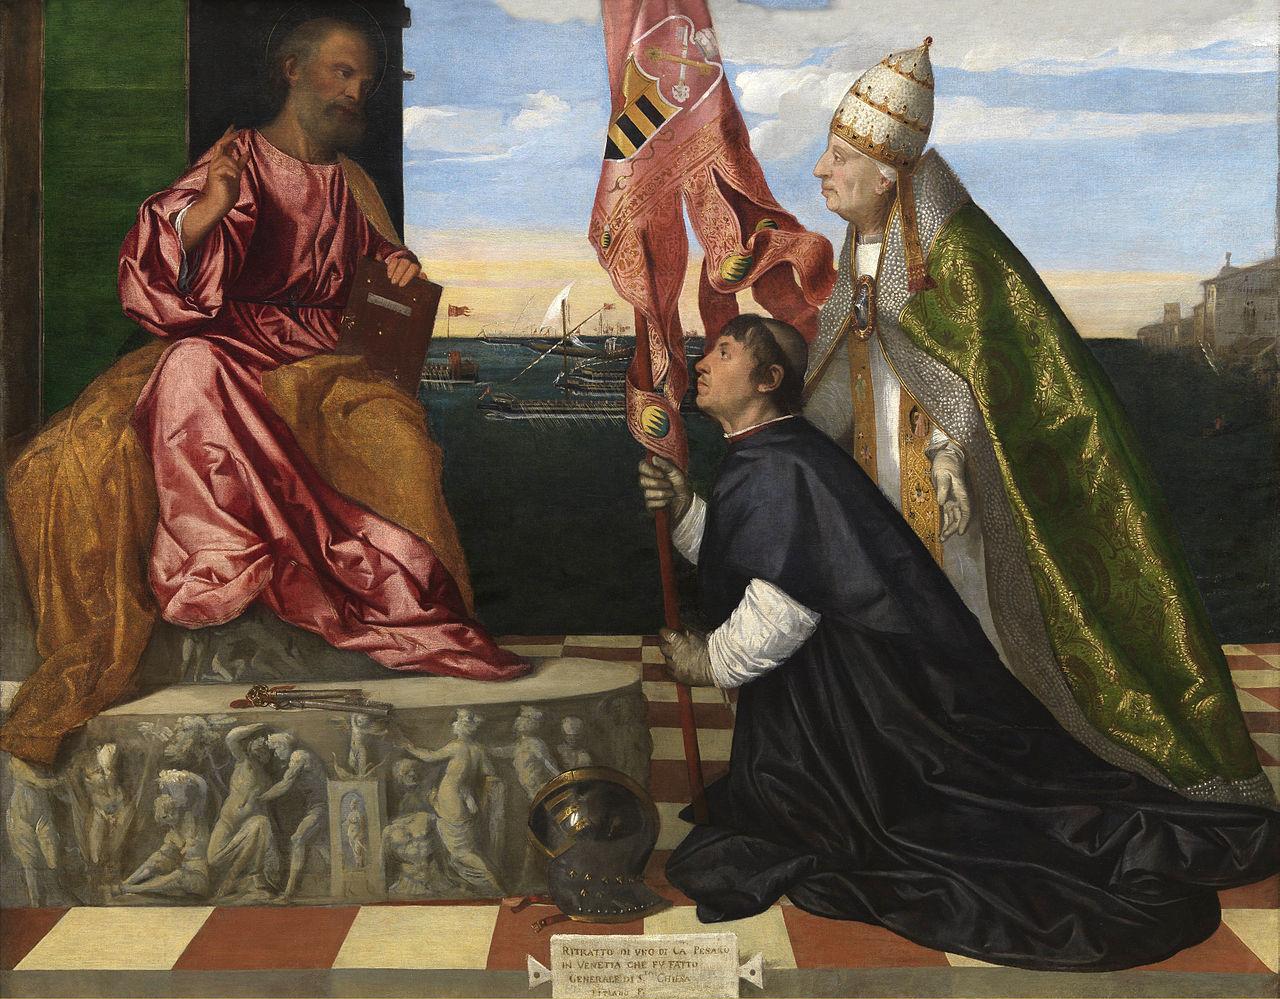 Jacopo_Pesaro_presented_to_St._Peter_by_Pope_Alexander_VI_-_Tizian-2.jpg